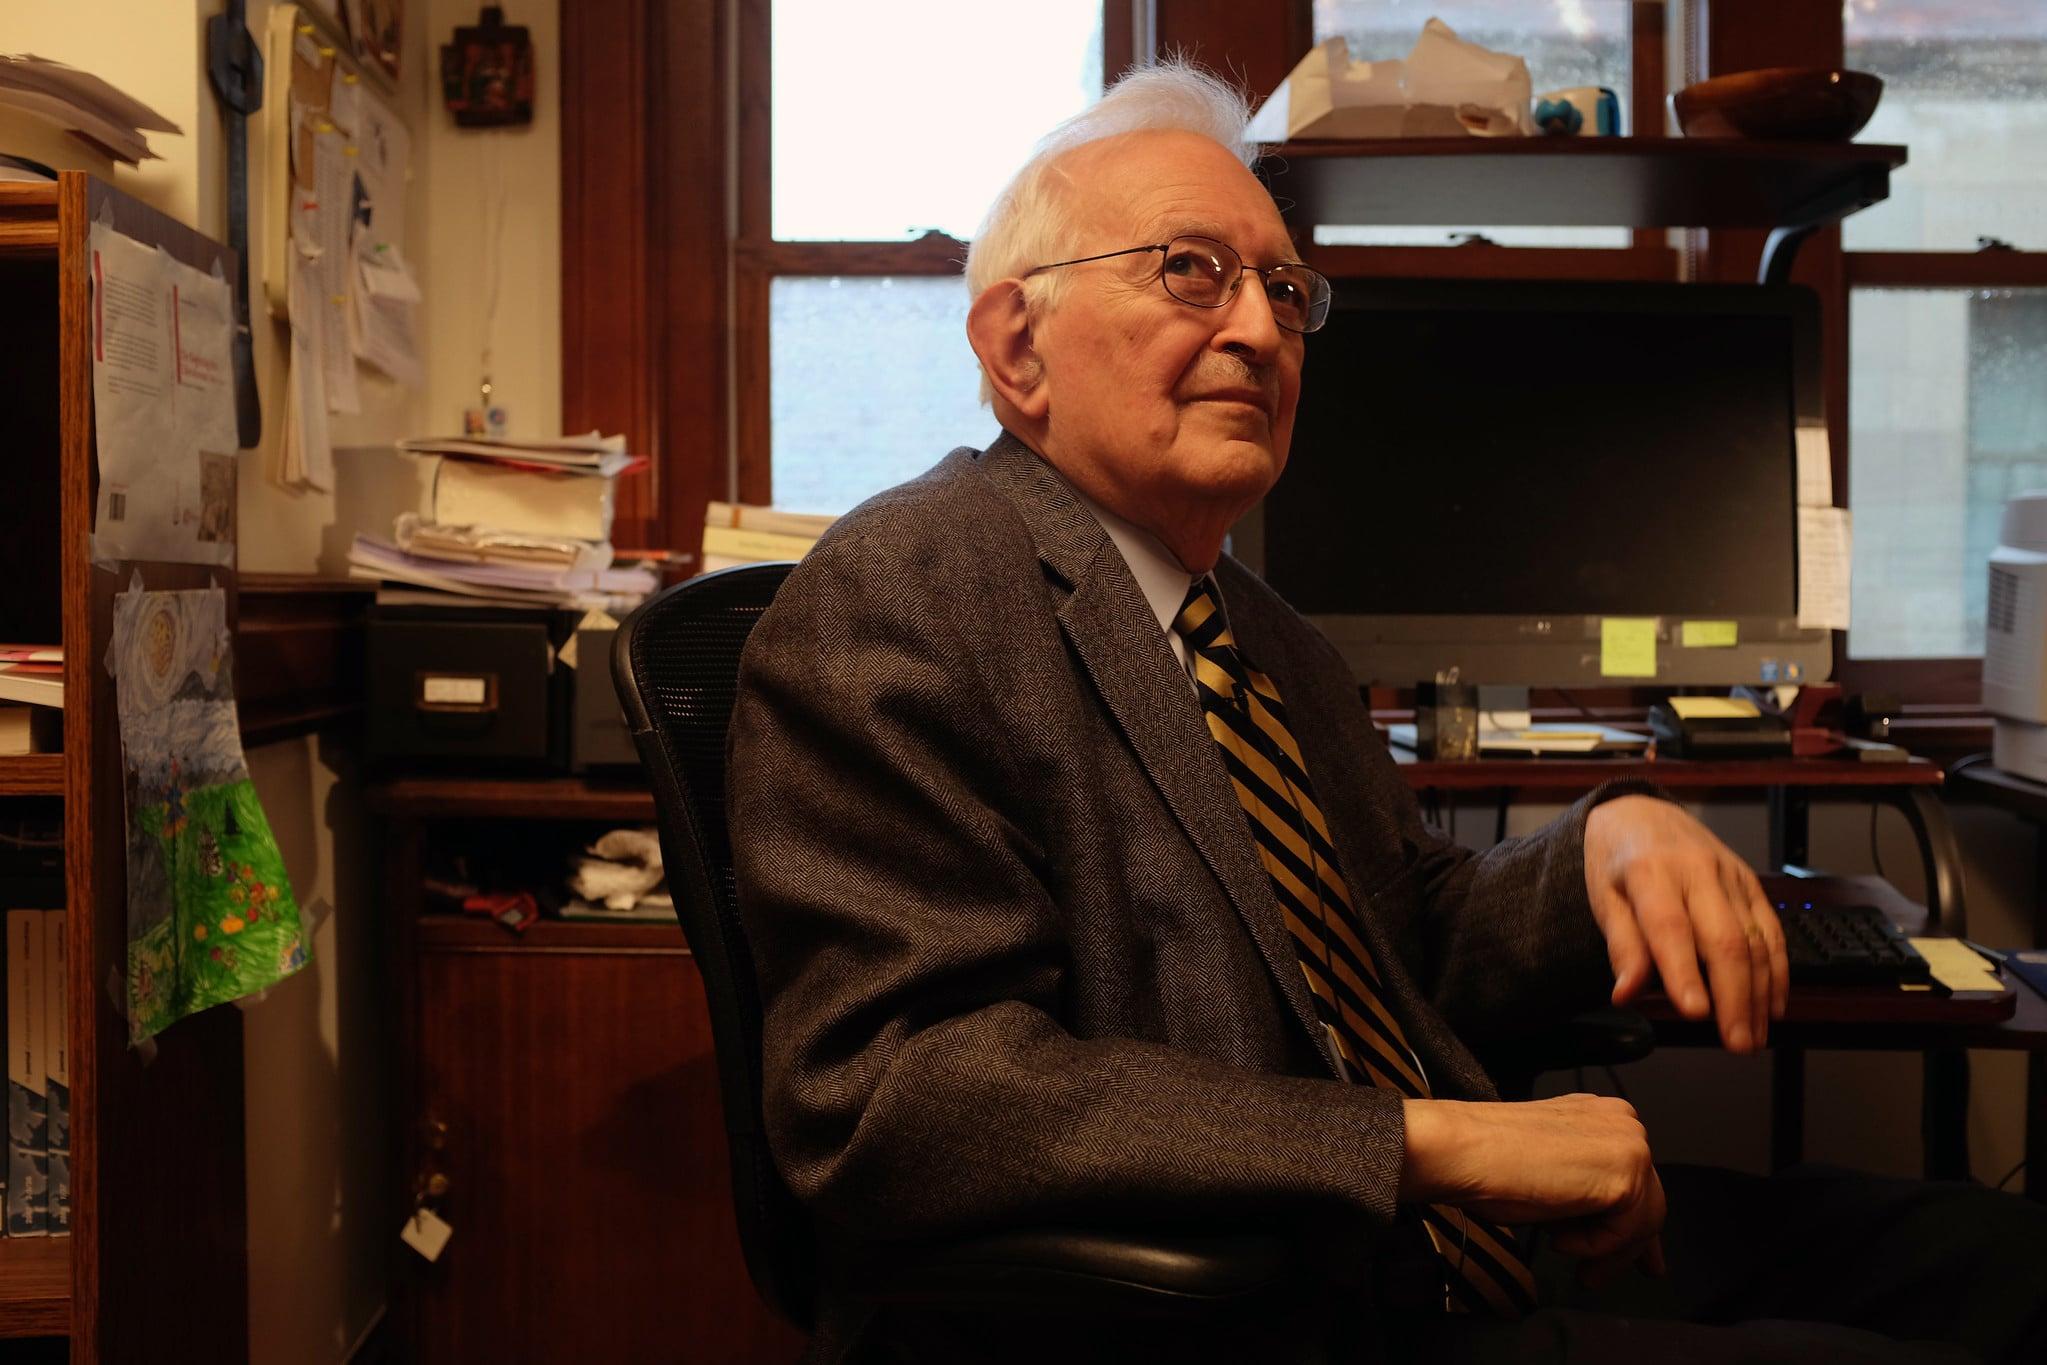 | Immanuel Wallerstein in his officeat Yale University April 20 2015 | MR Online